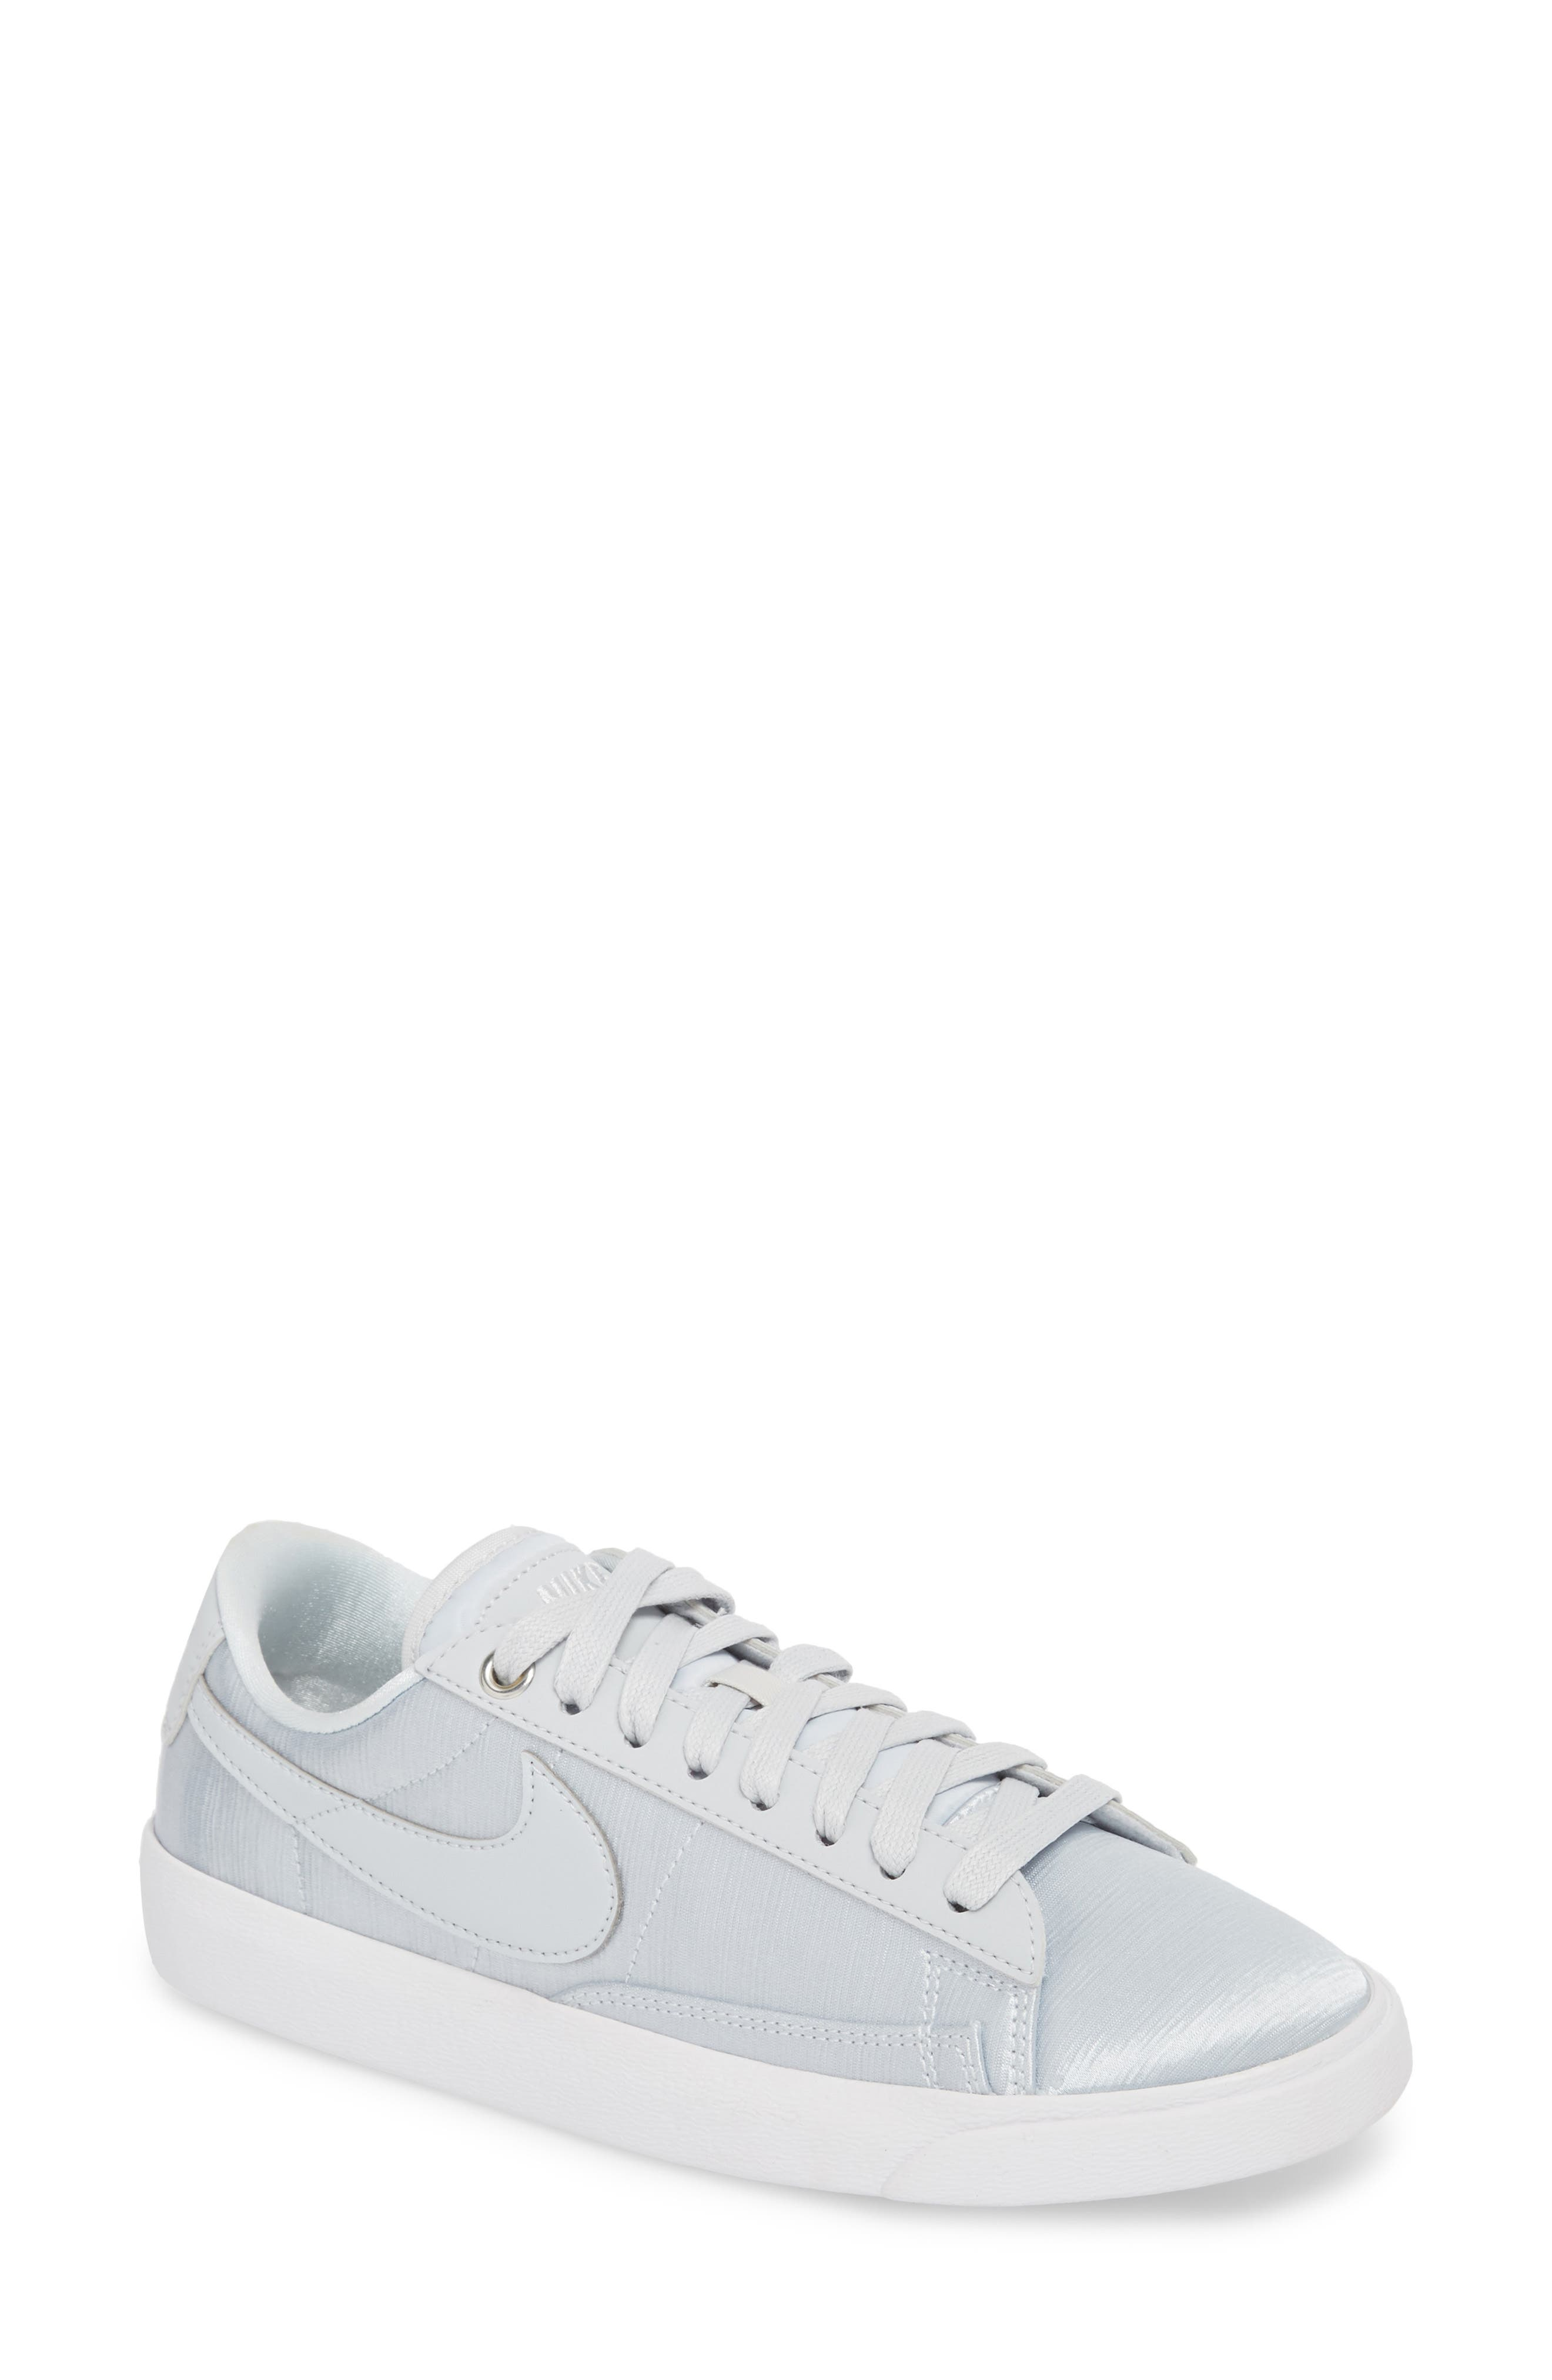 Blazer Low Top Sneaker SE,                             Main thumbnail 1, color,                             040